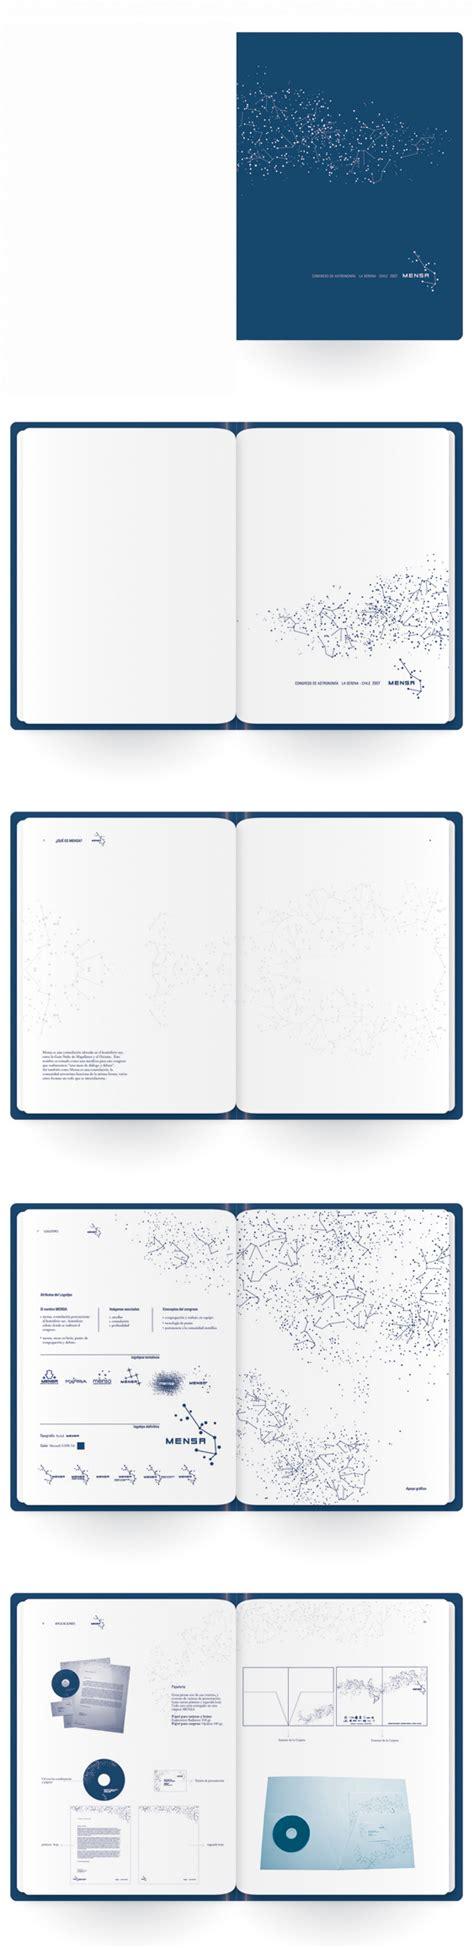 book layout behance mensa book layout on behance